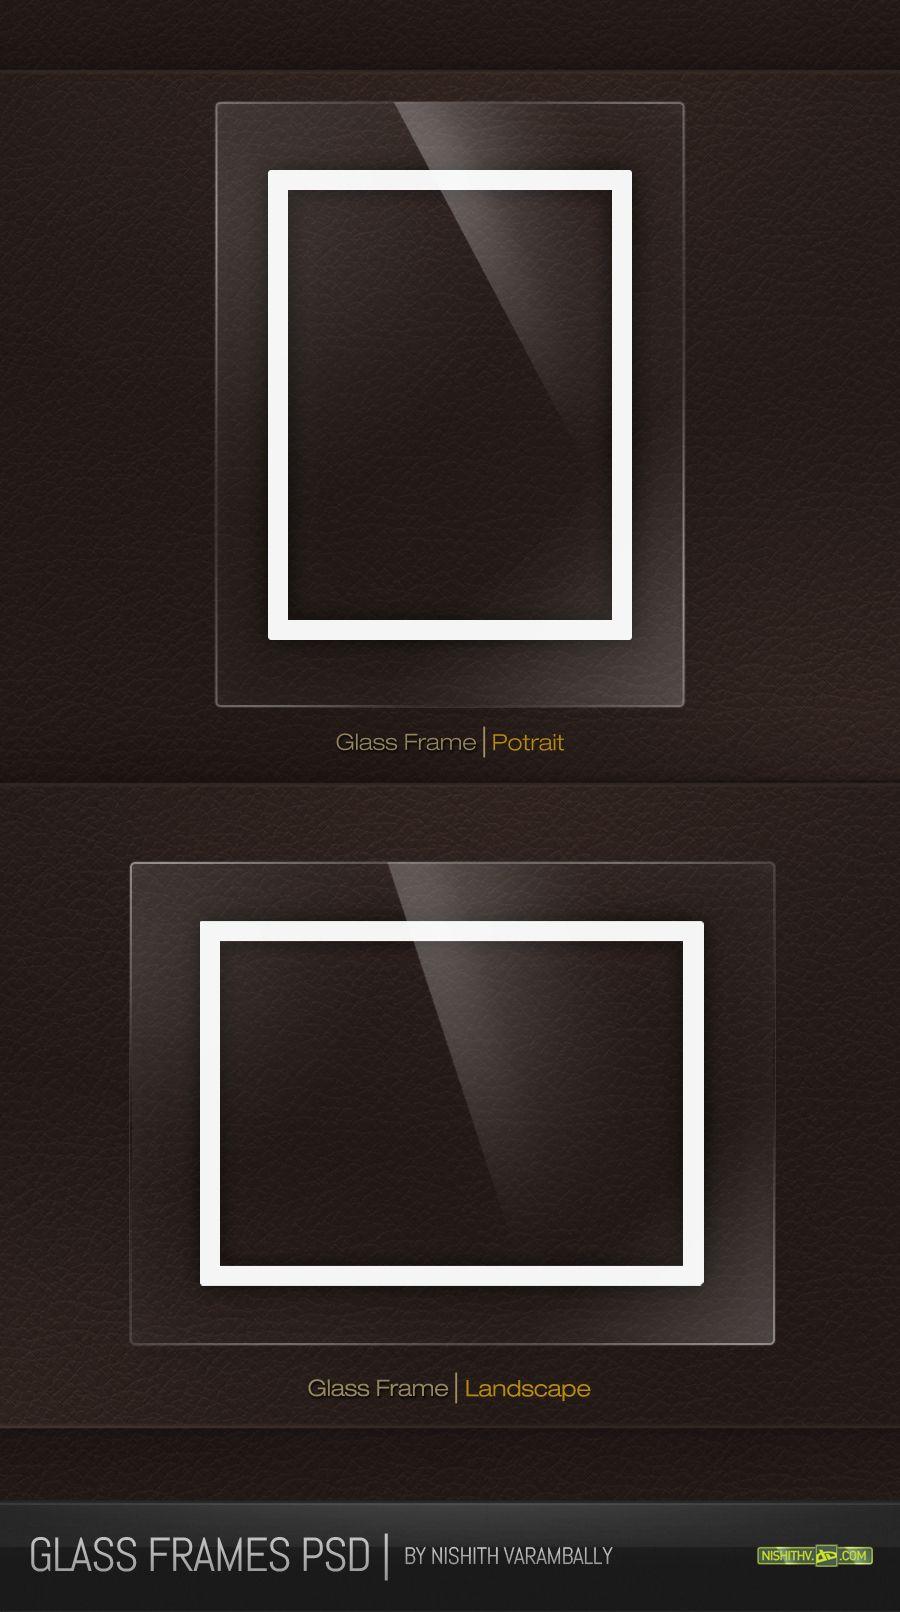 Glass Frames Psd Glass Frames Free Photo Frames Psd Free Download